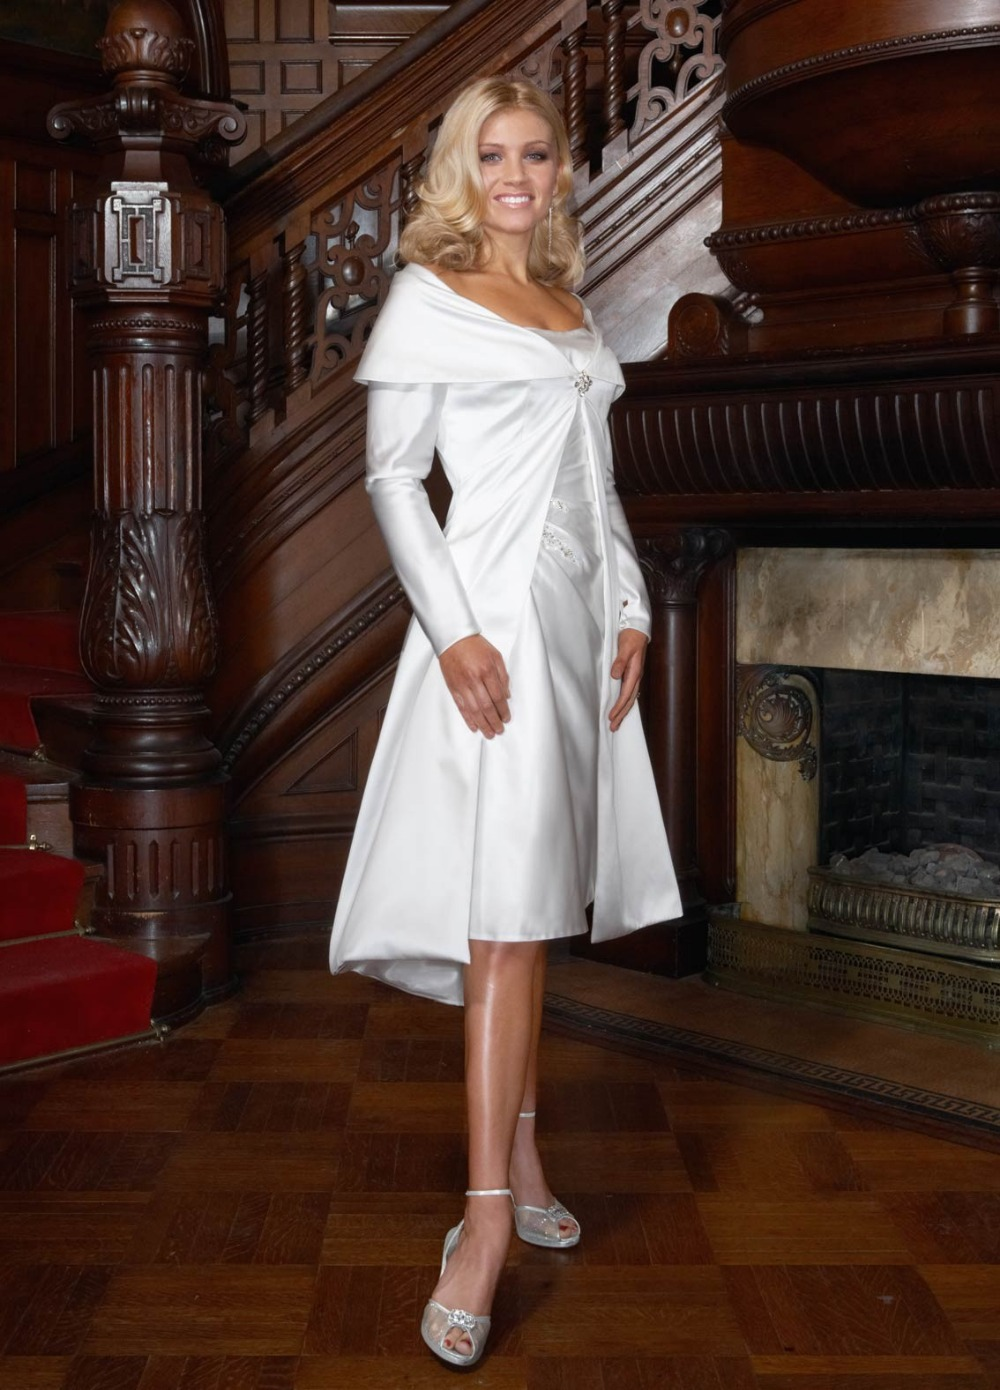 online shop sexy short wedding dress 2015 pearls a line fashionable cheap white tea length plus size wedding dress with detachable skirt aliexpress mobile